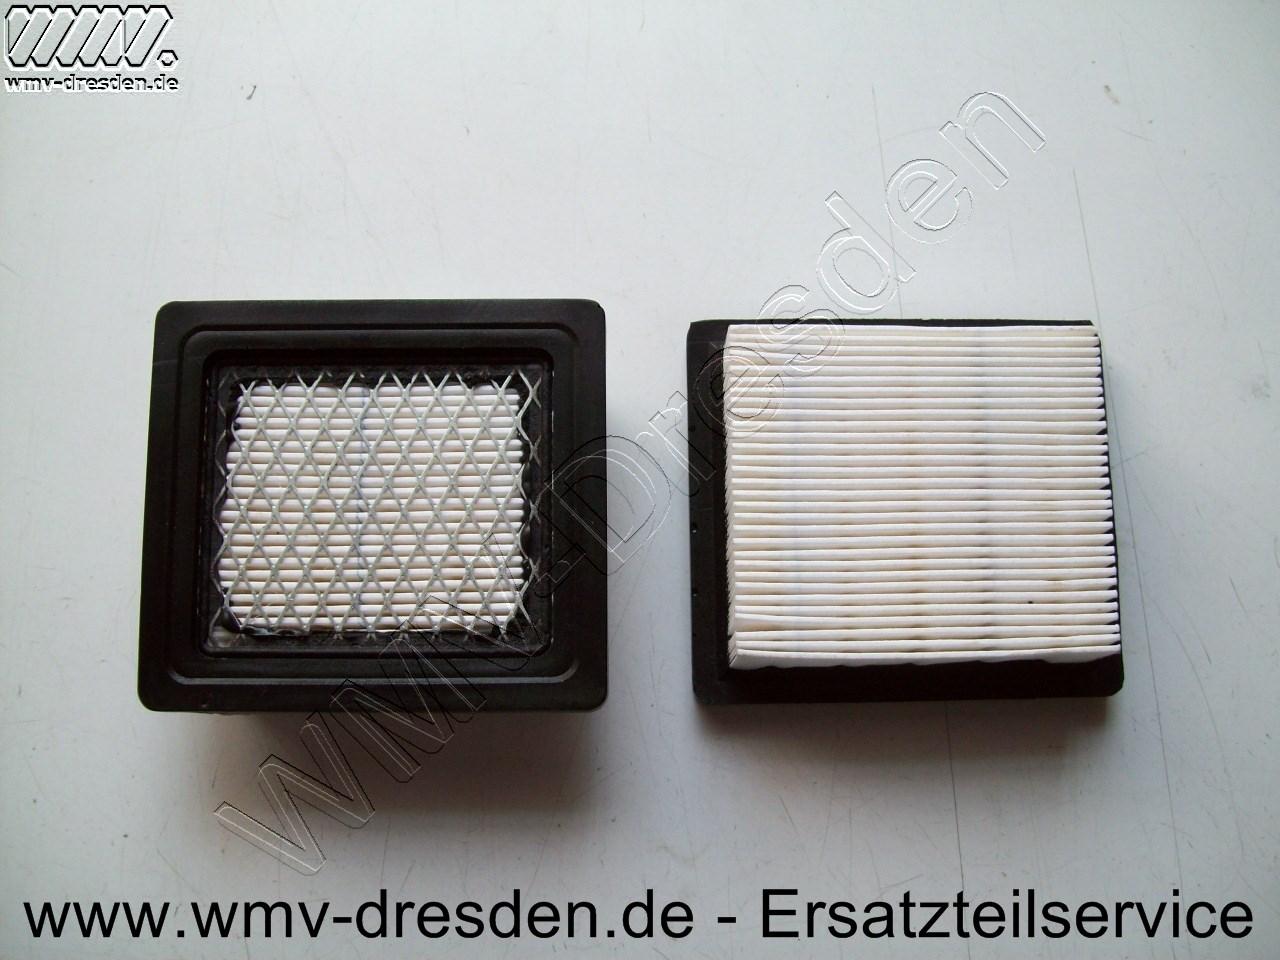 Luftfilter L 98 mm, B 87 mm, H 32 mm